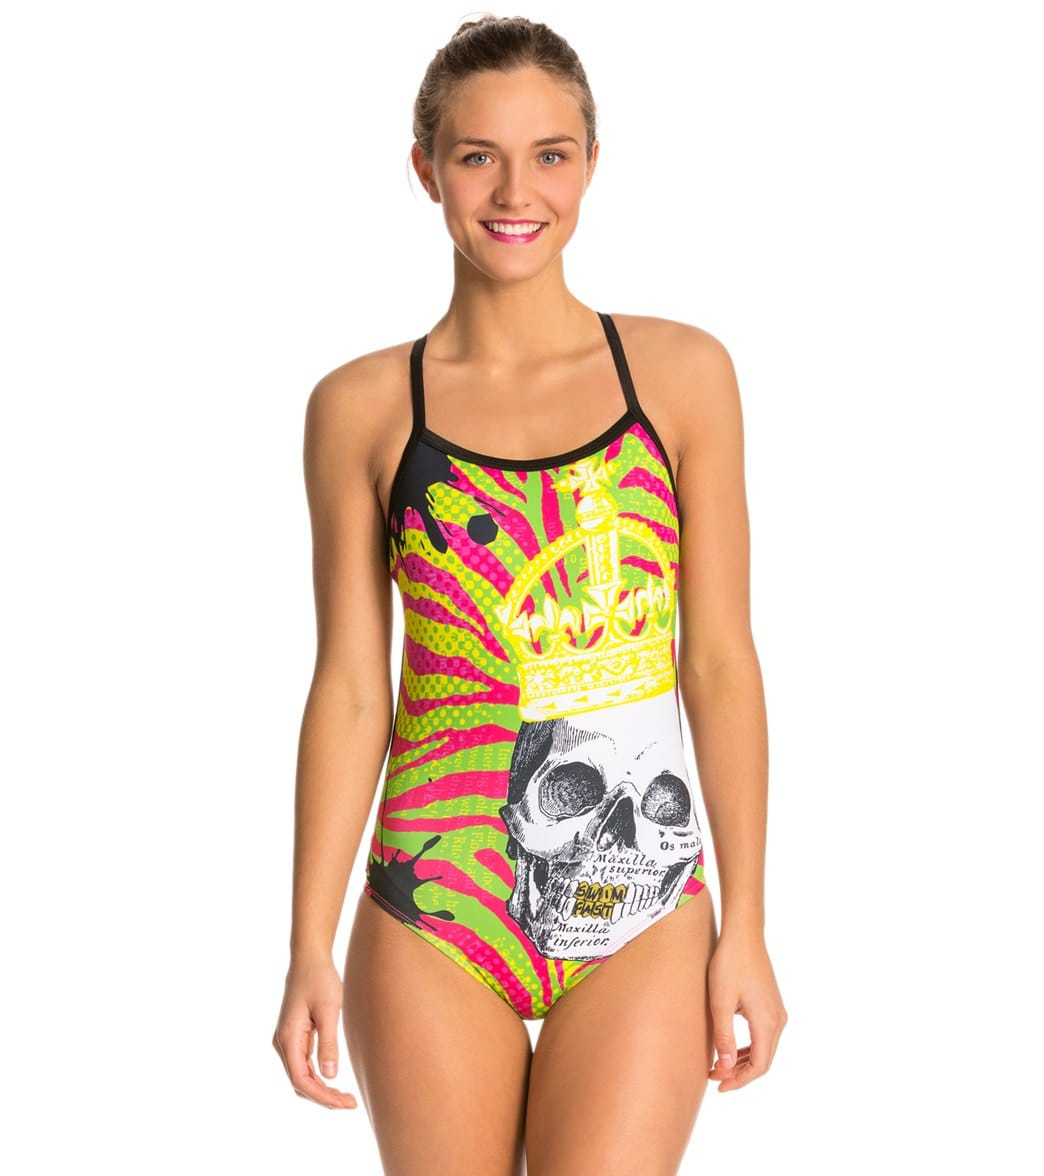 Hardcoresport Women's Royalty Cali Back One Piece Swimsuit